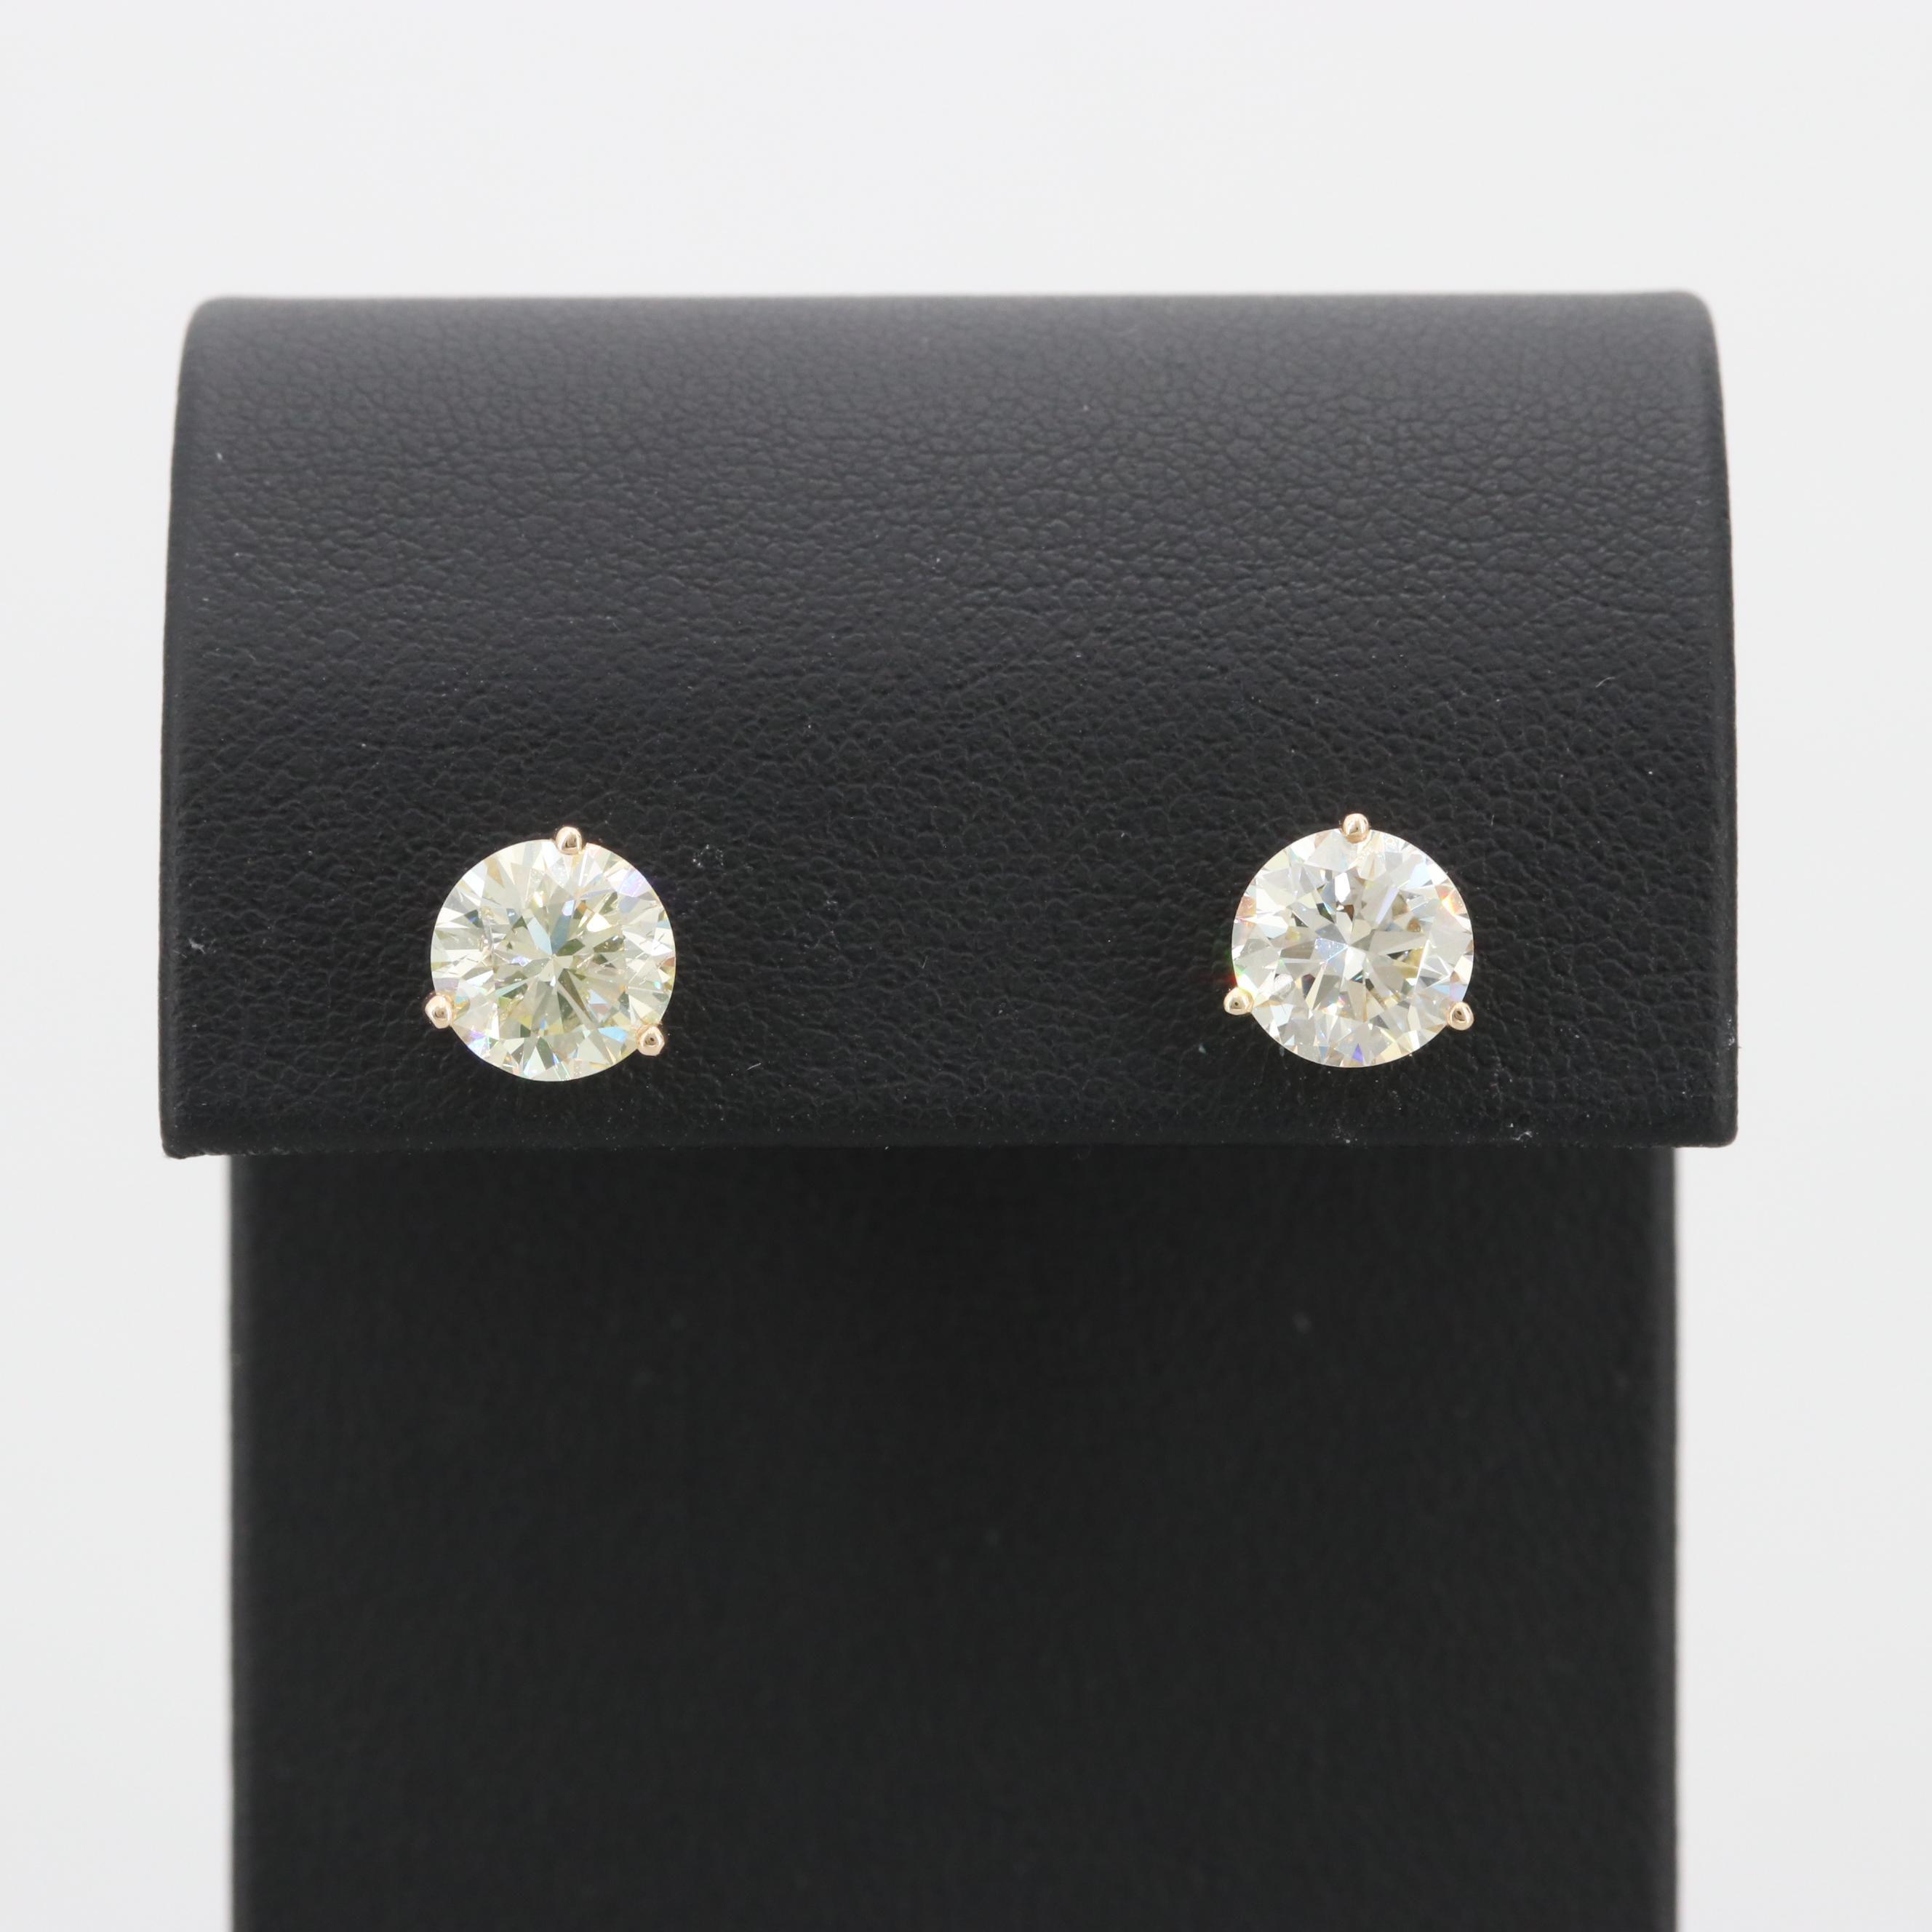 14K Yellow Gold 3.17 CTW Diamond Earrings